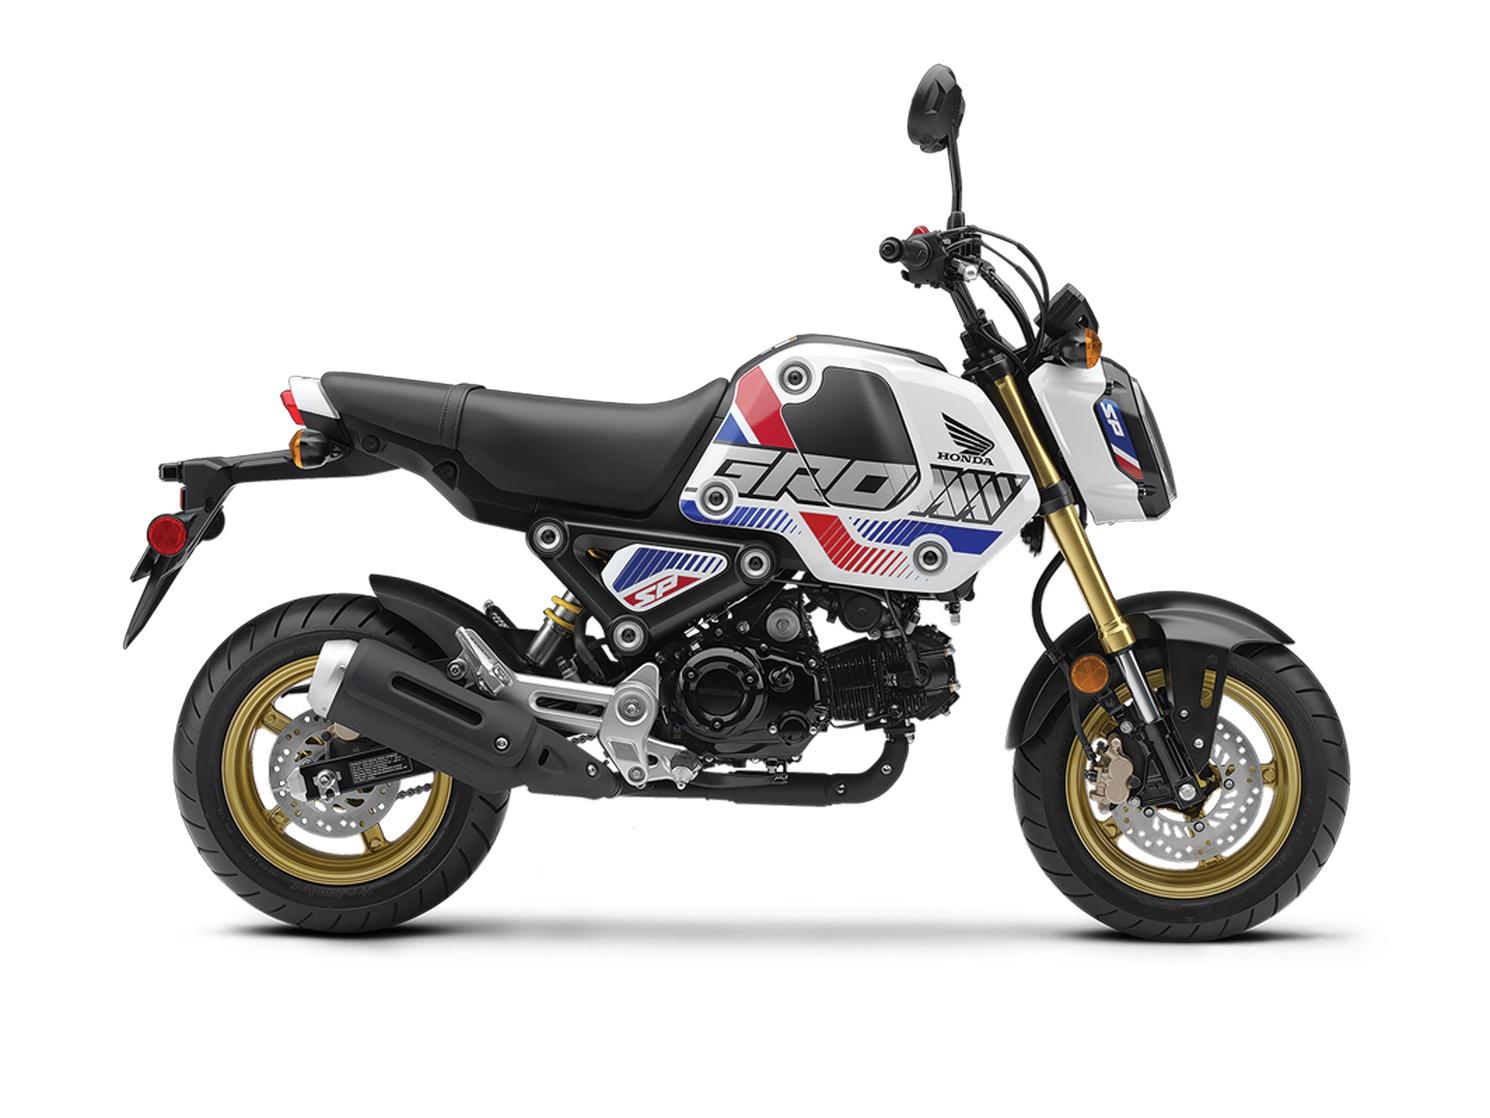 Honda Grom ABS Blanc Horizon Nacré (Tricolore) 2022